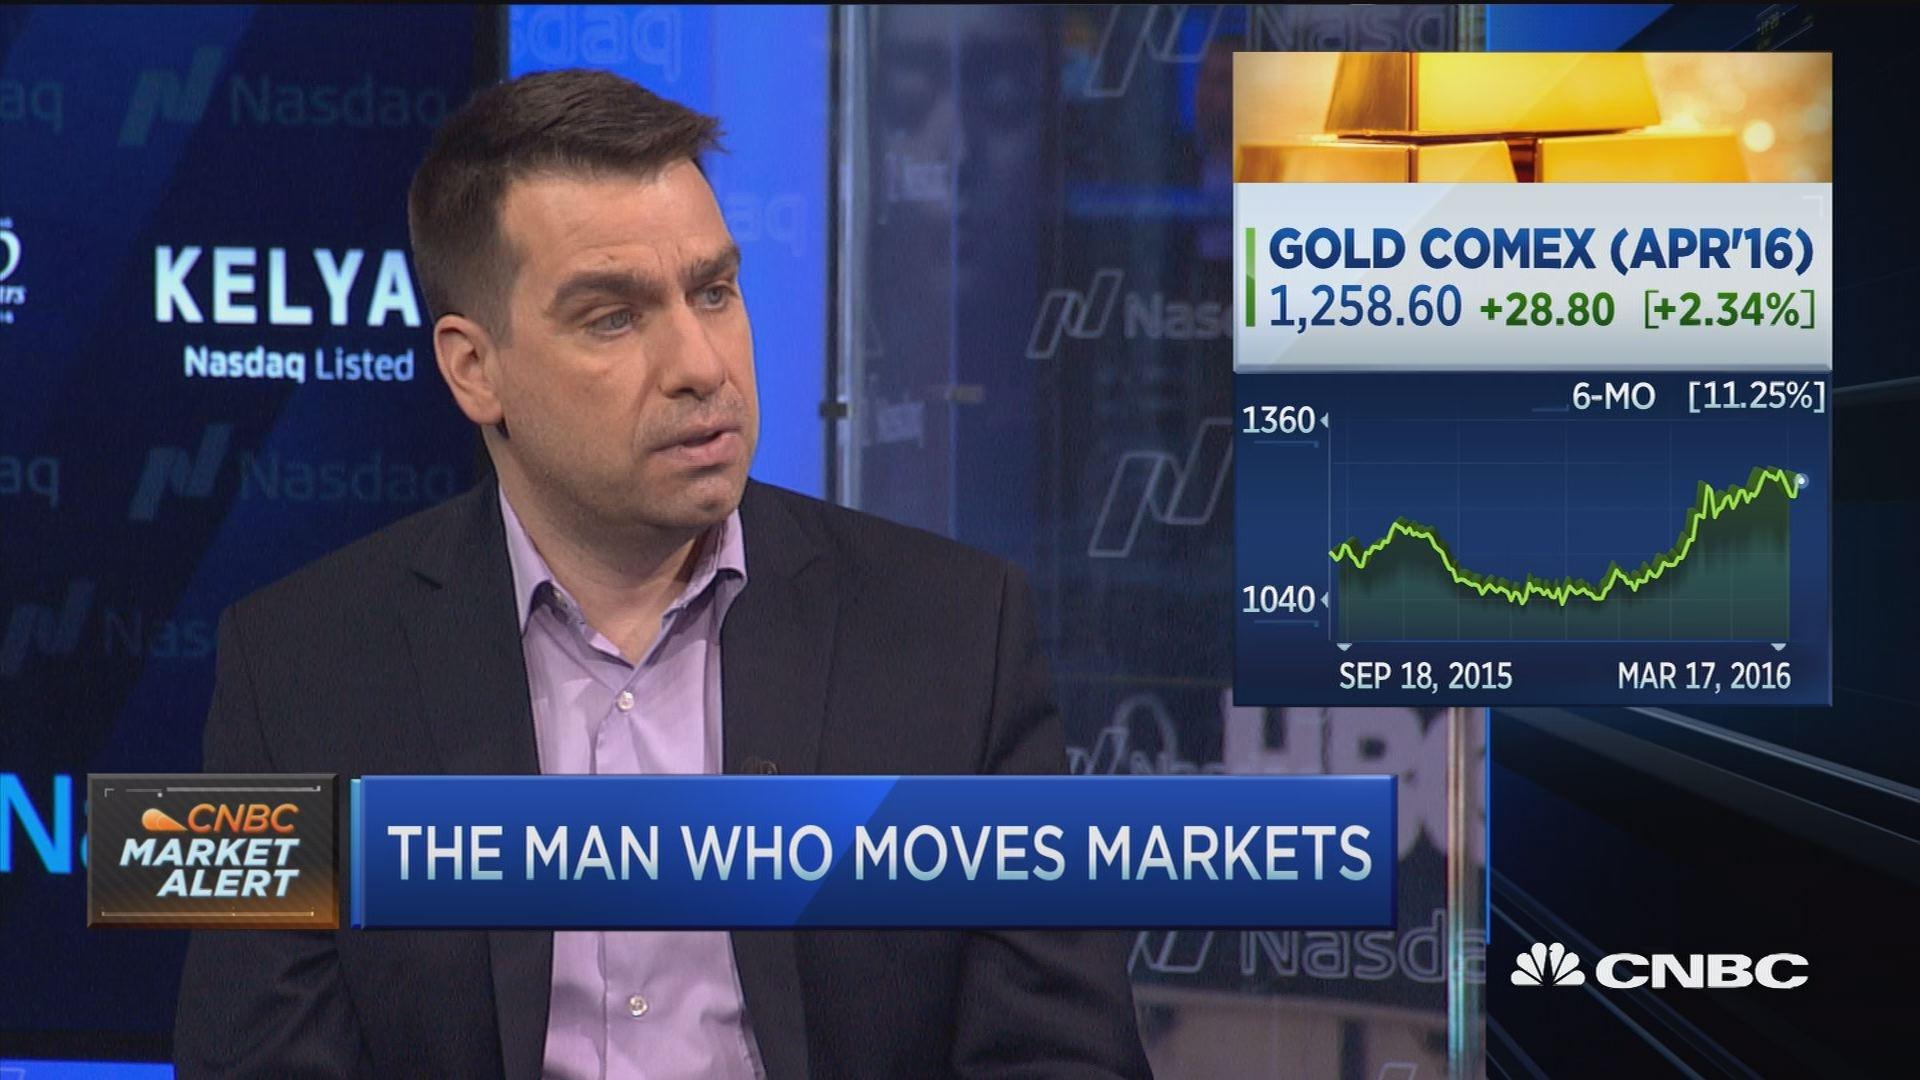 JPMorgan Chase's forecaster says buy gold, not stocks